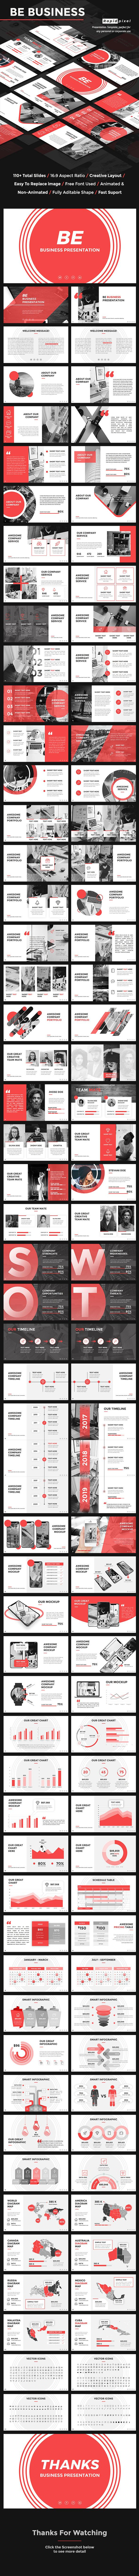 Be Business Keynote - Business Keynote Templates